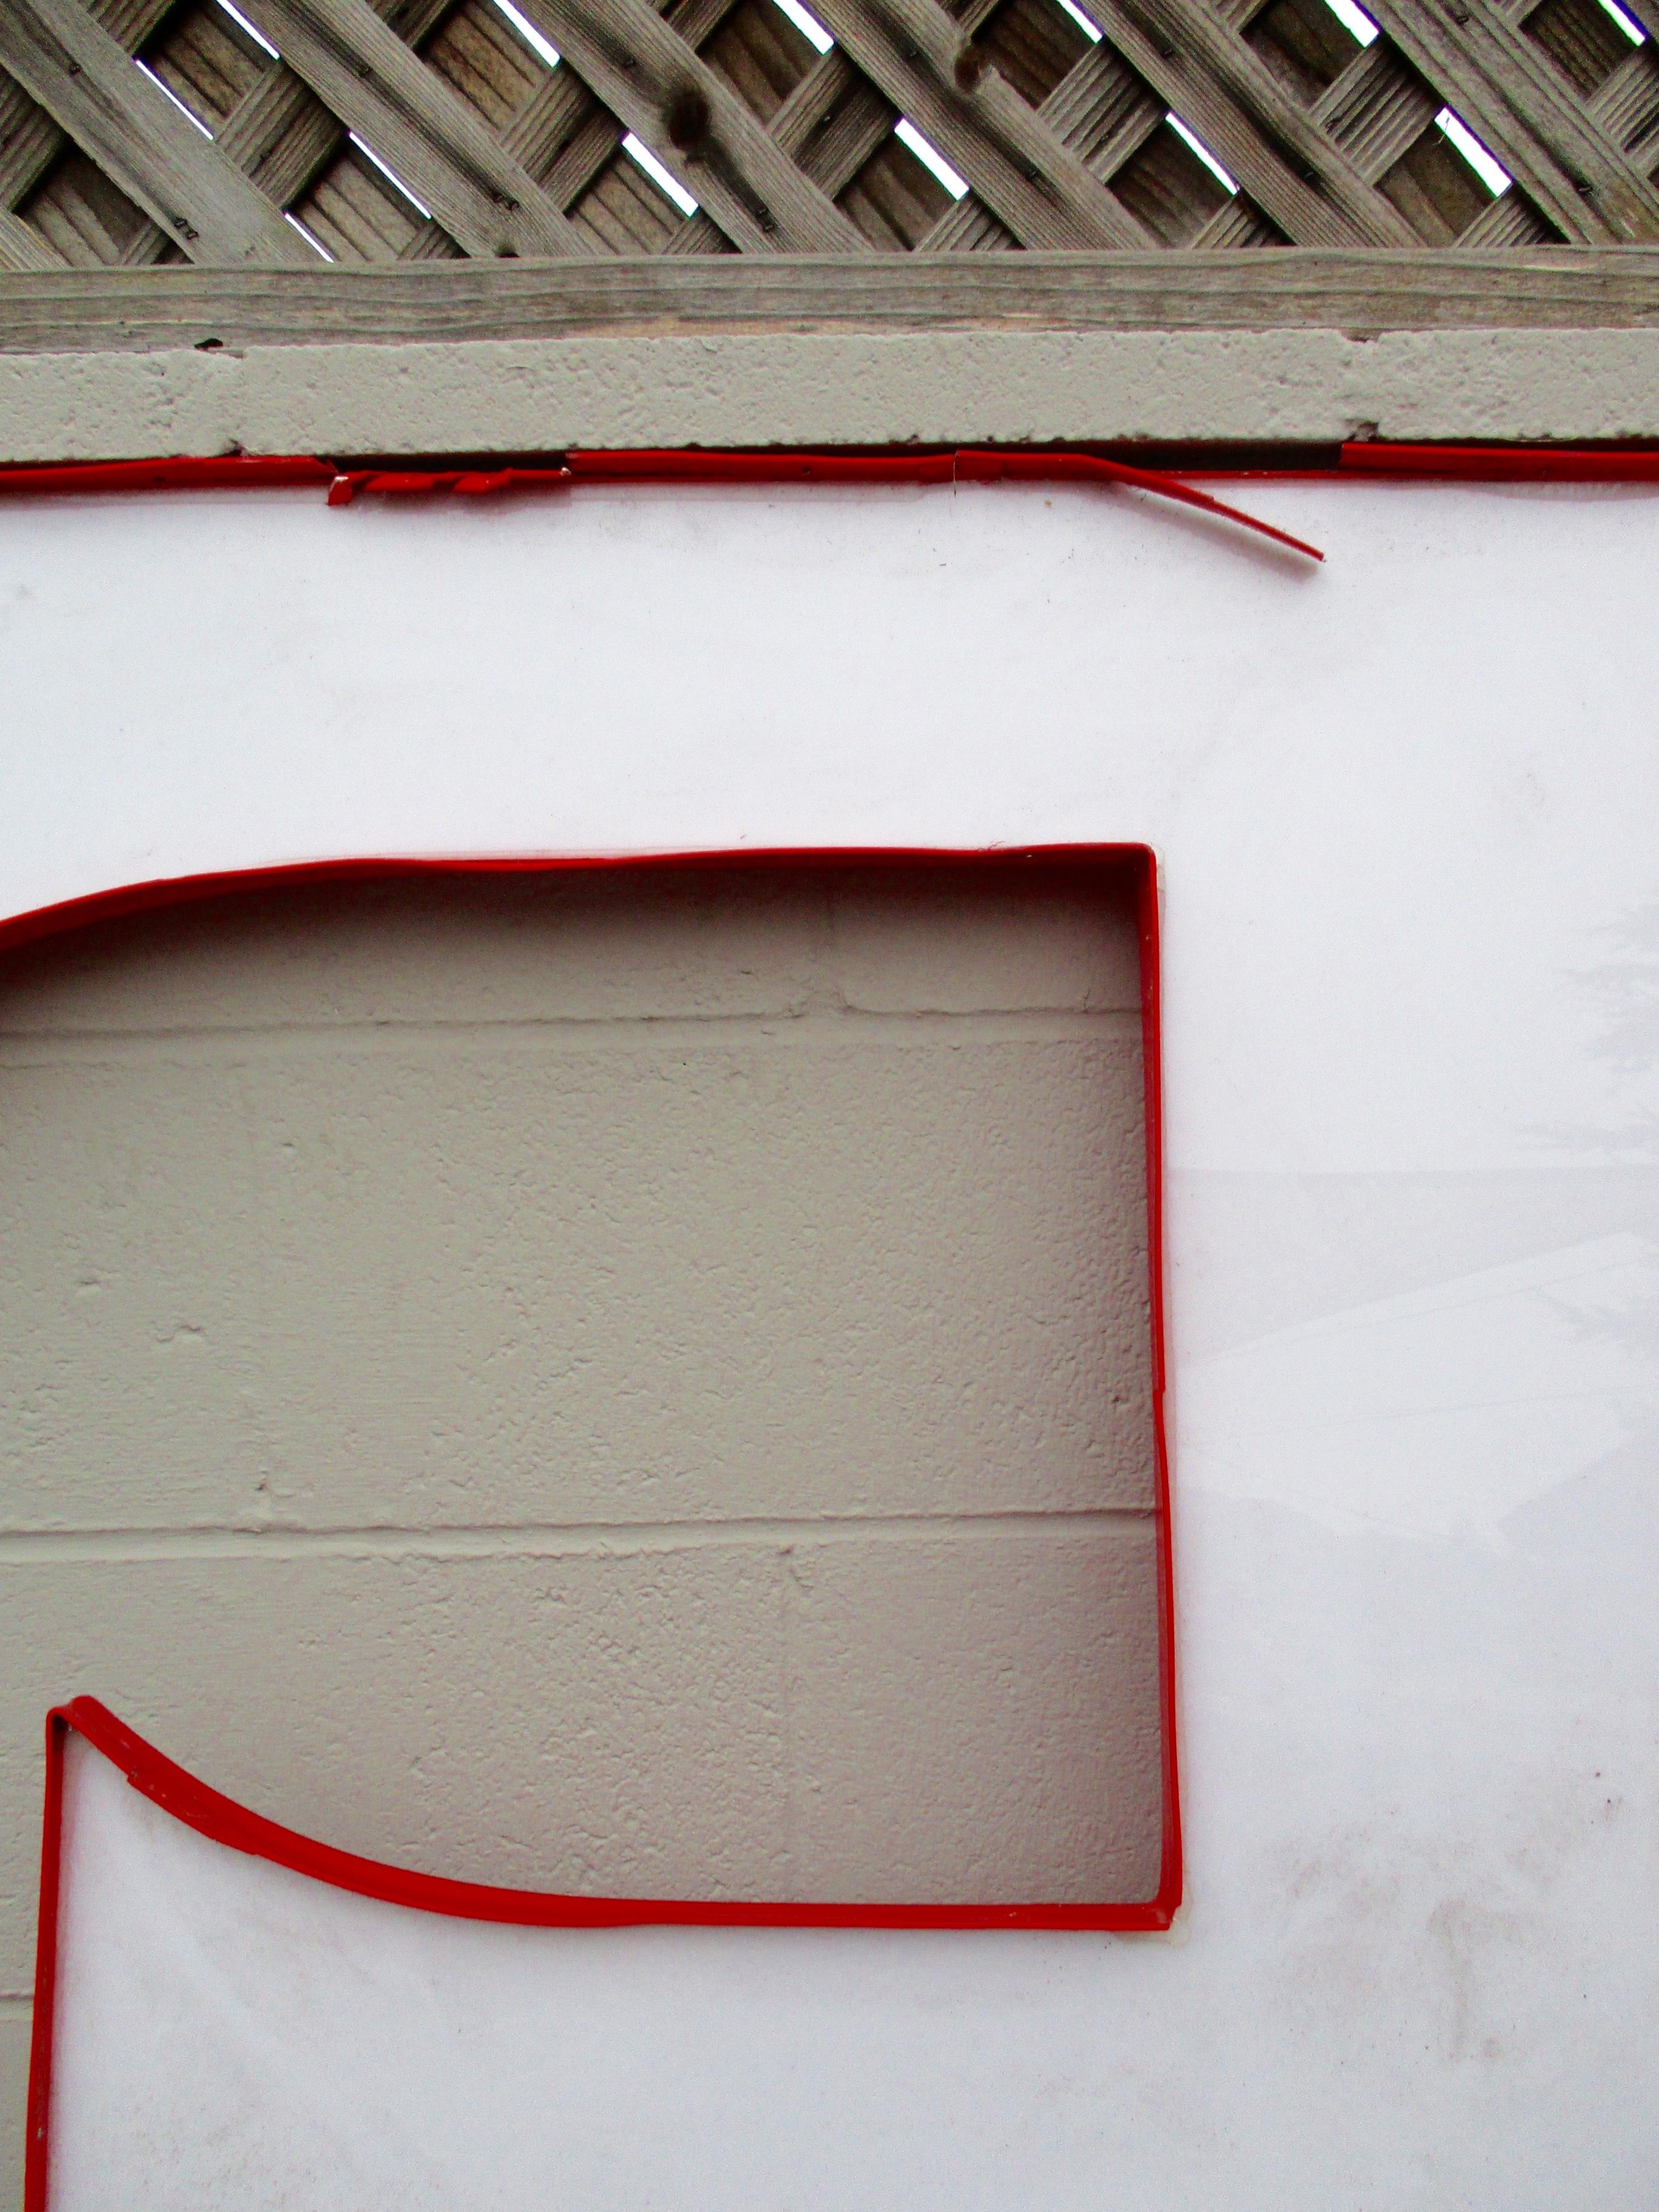 S F San Francisco California Pop Art Prop   S/2 Sign Letters   Image 6